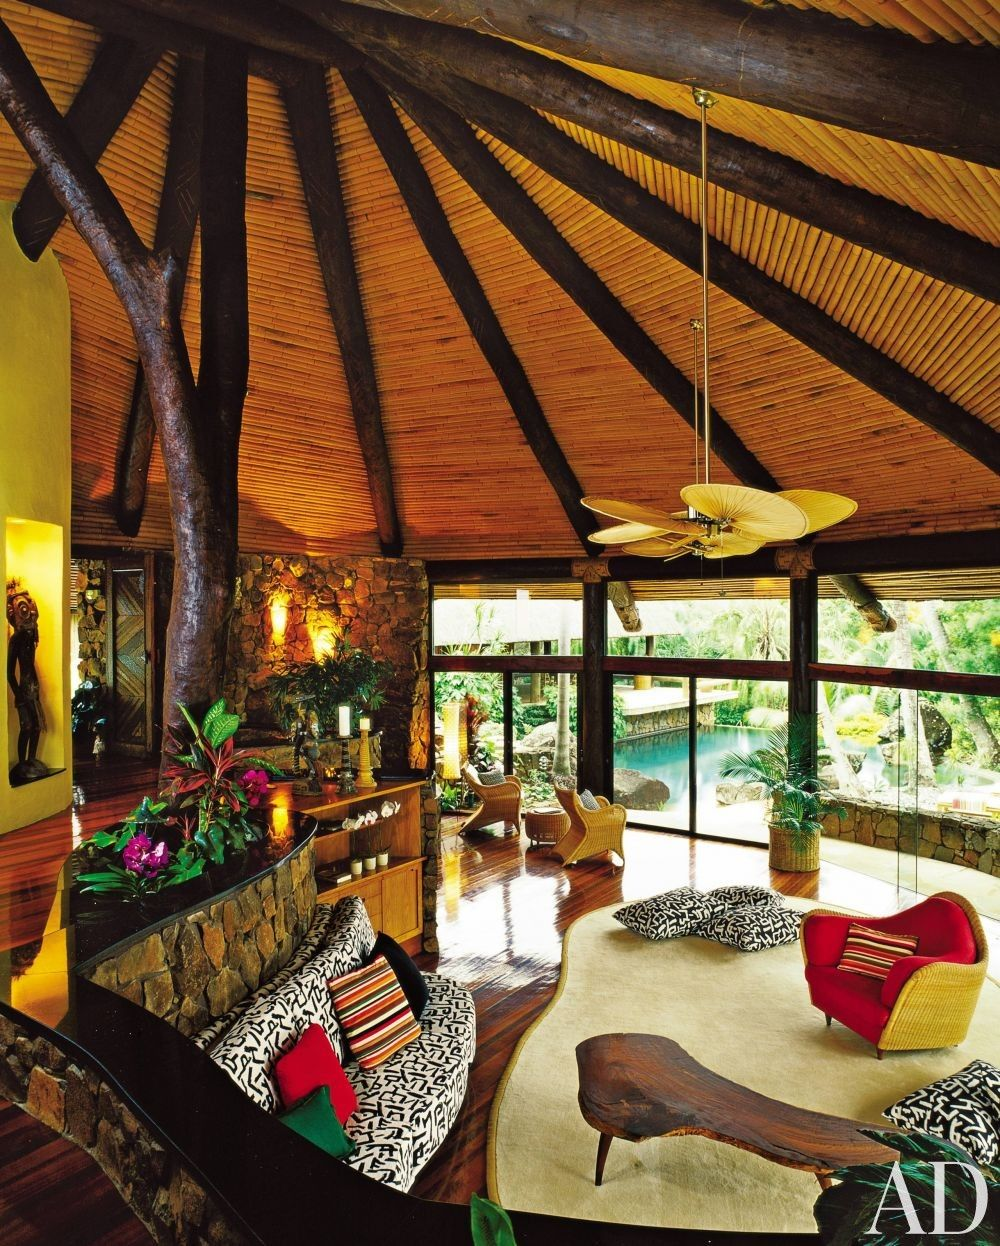 Exotic Living Room by Pamela Mathieson Croci and Roger Parkin in Hamilton Island, Australia